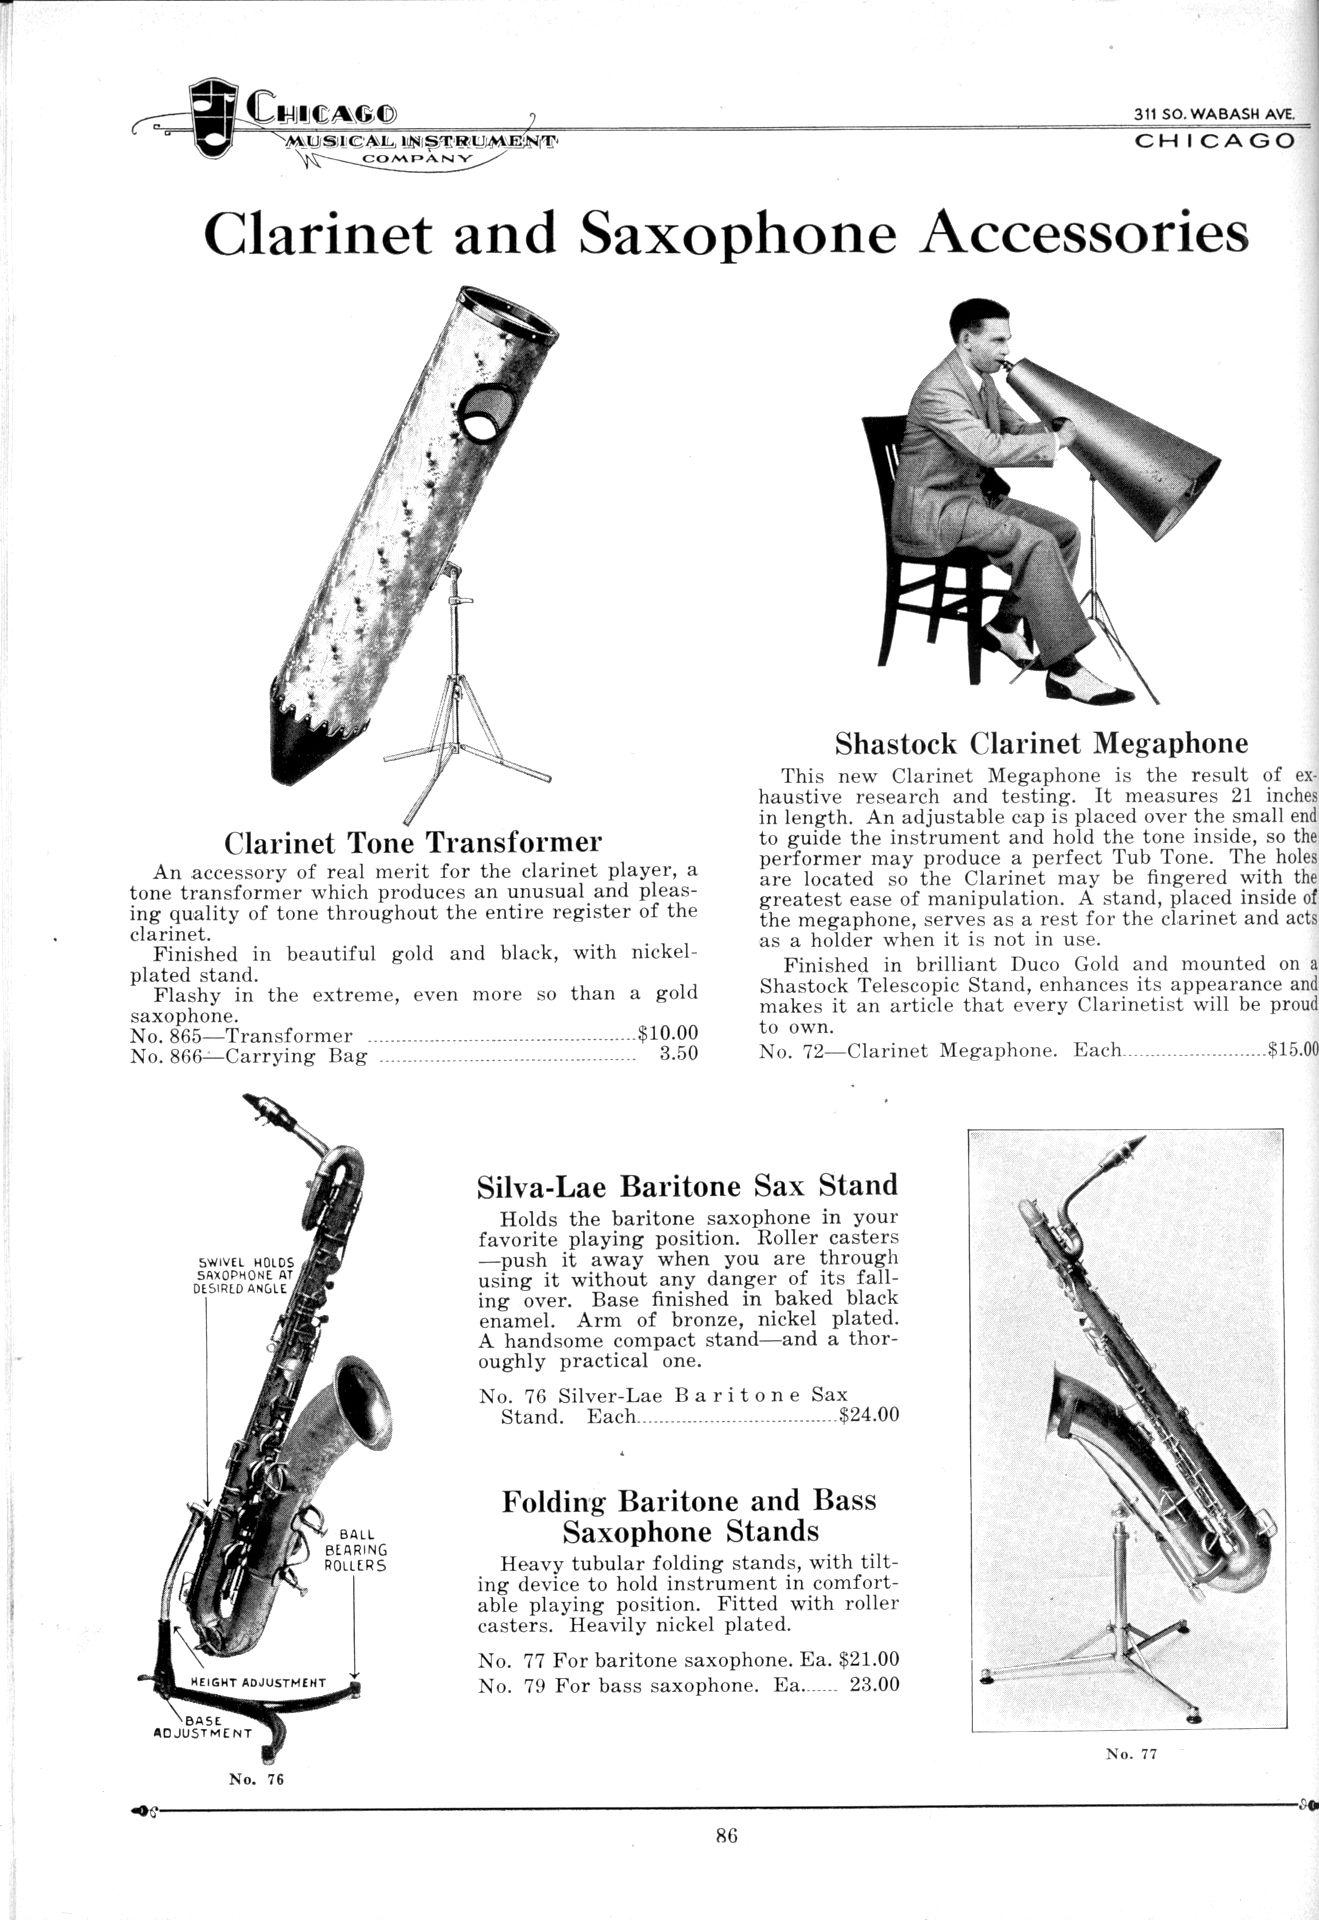 Chicago Musical Instrument Company catalogue, 1931, Hamilton bari & bass sax stands, Silva-Lae baritone sax stand, clarinet tone transformer, Shastock clarinet megaphone